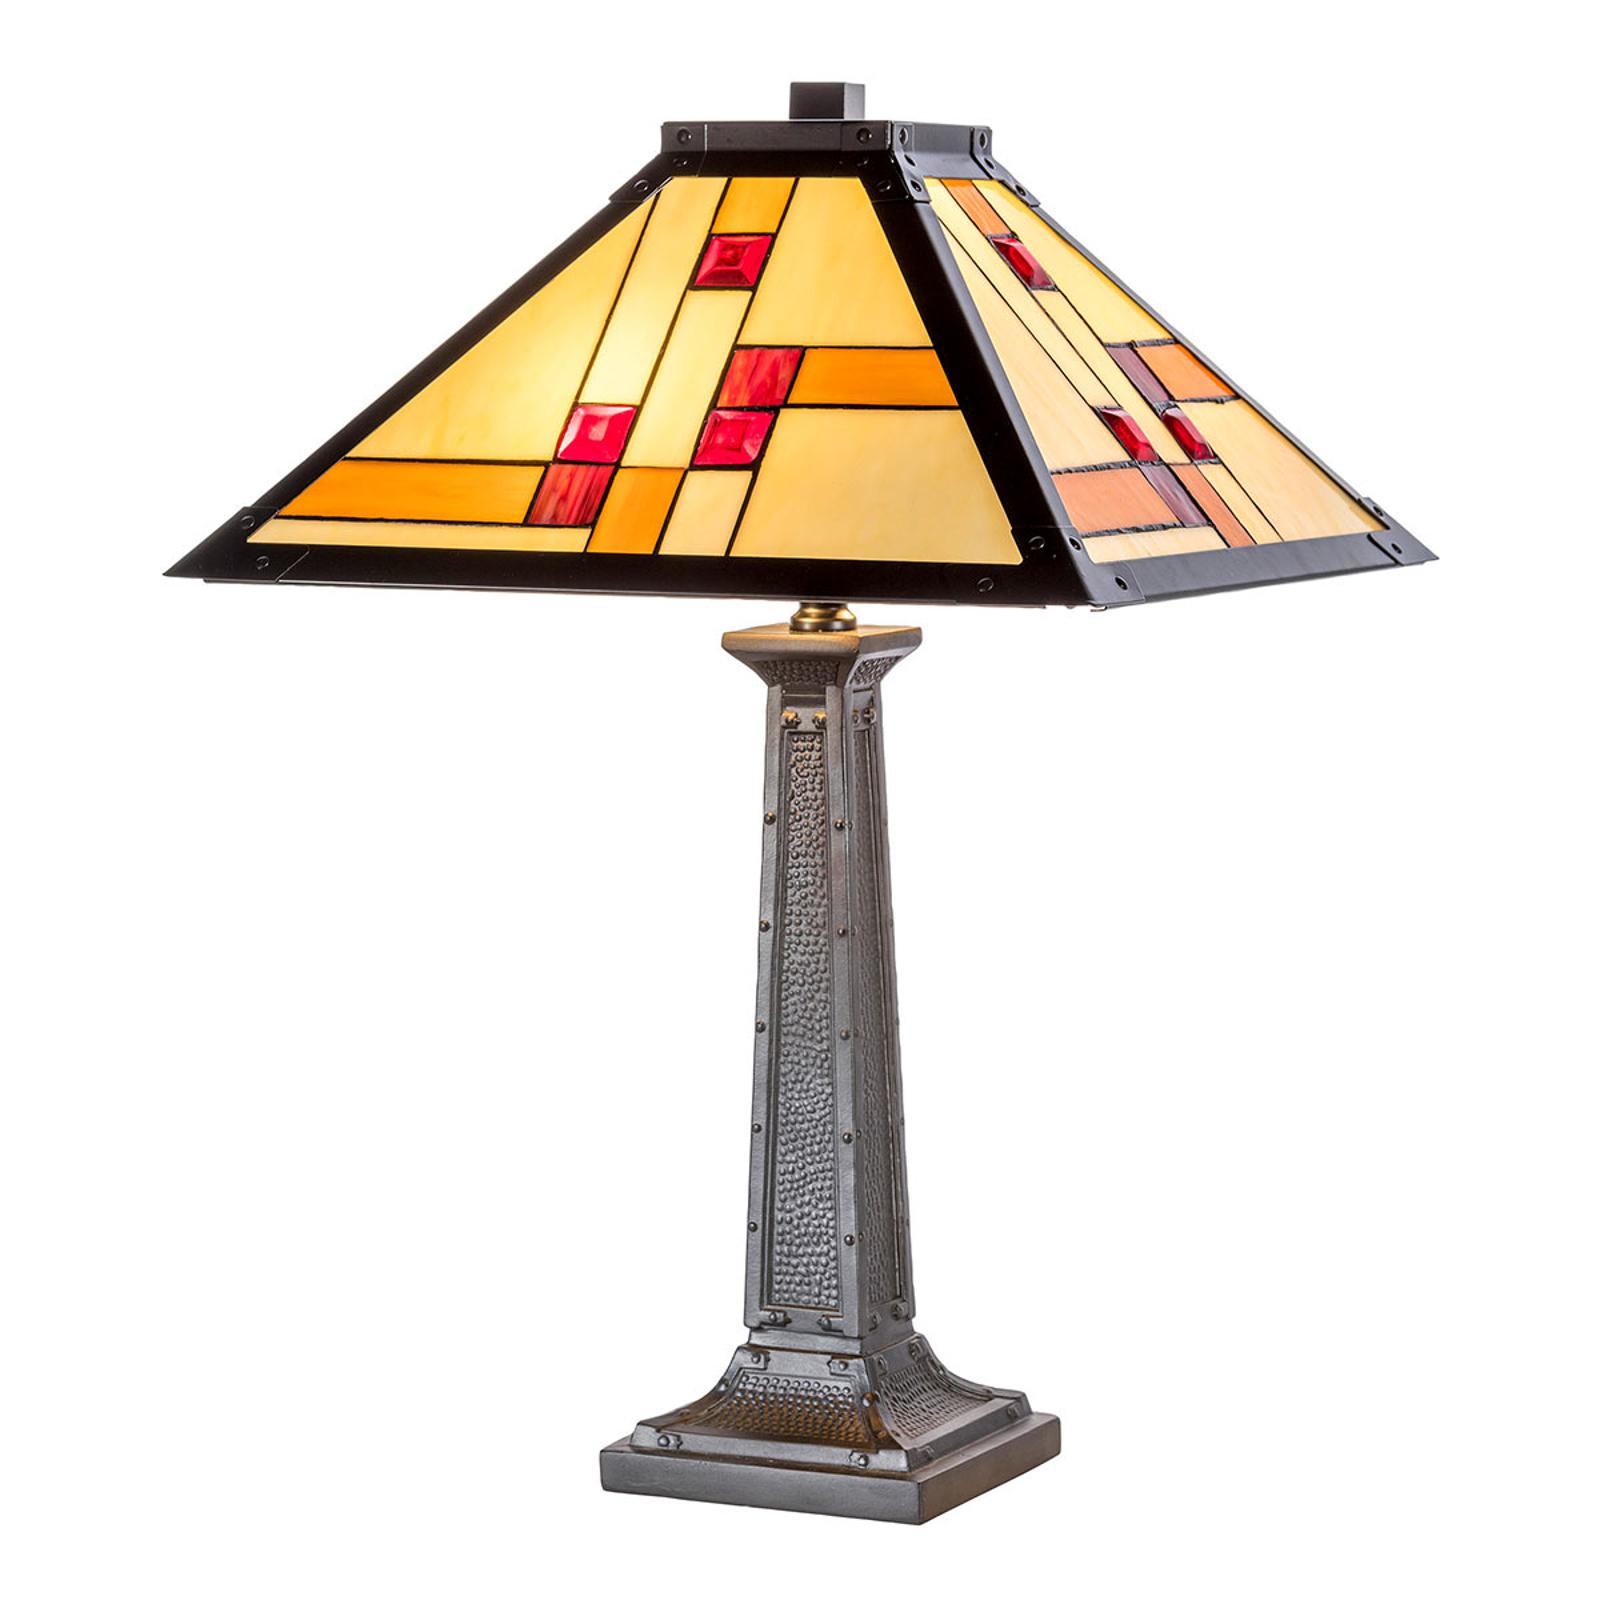 KT1836-40+P1836 bordlampe i Tiffany-stil